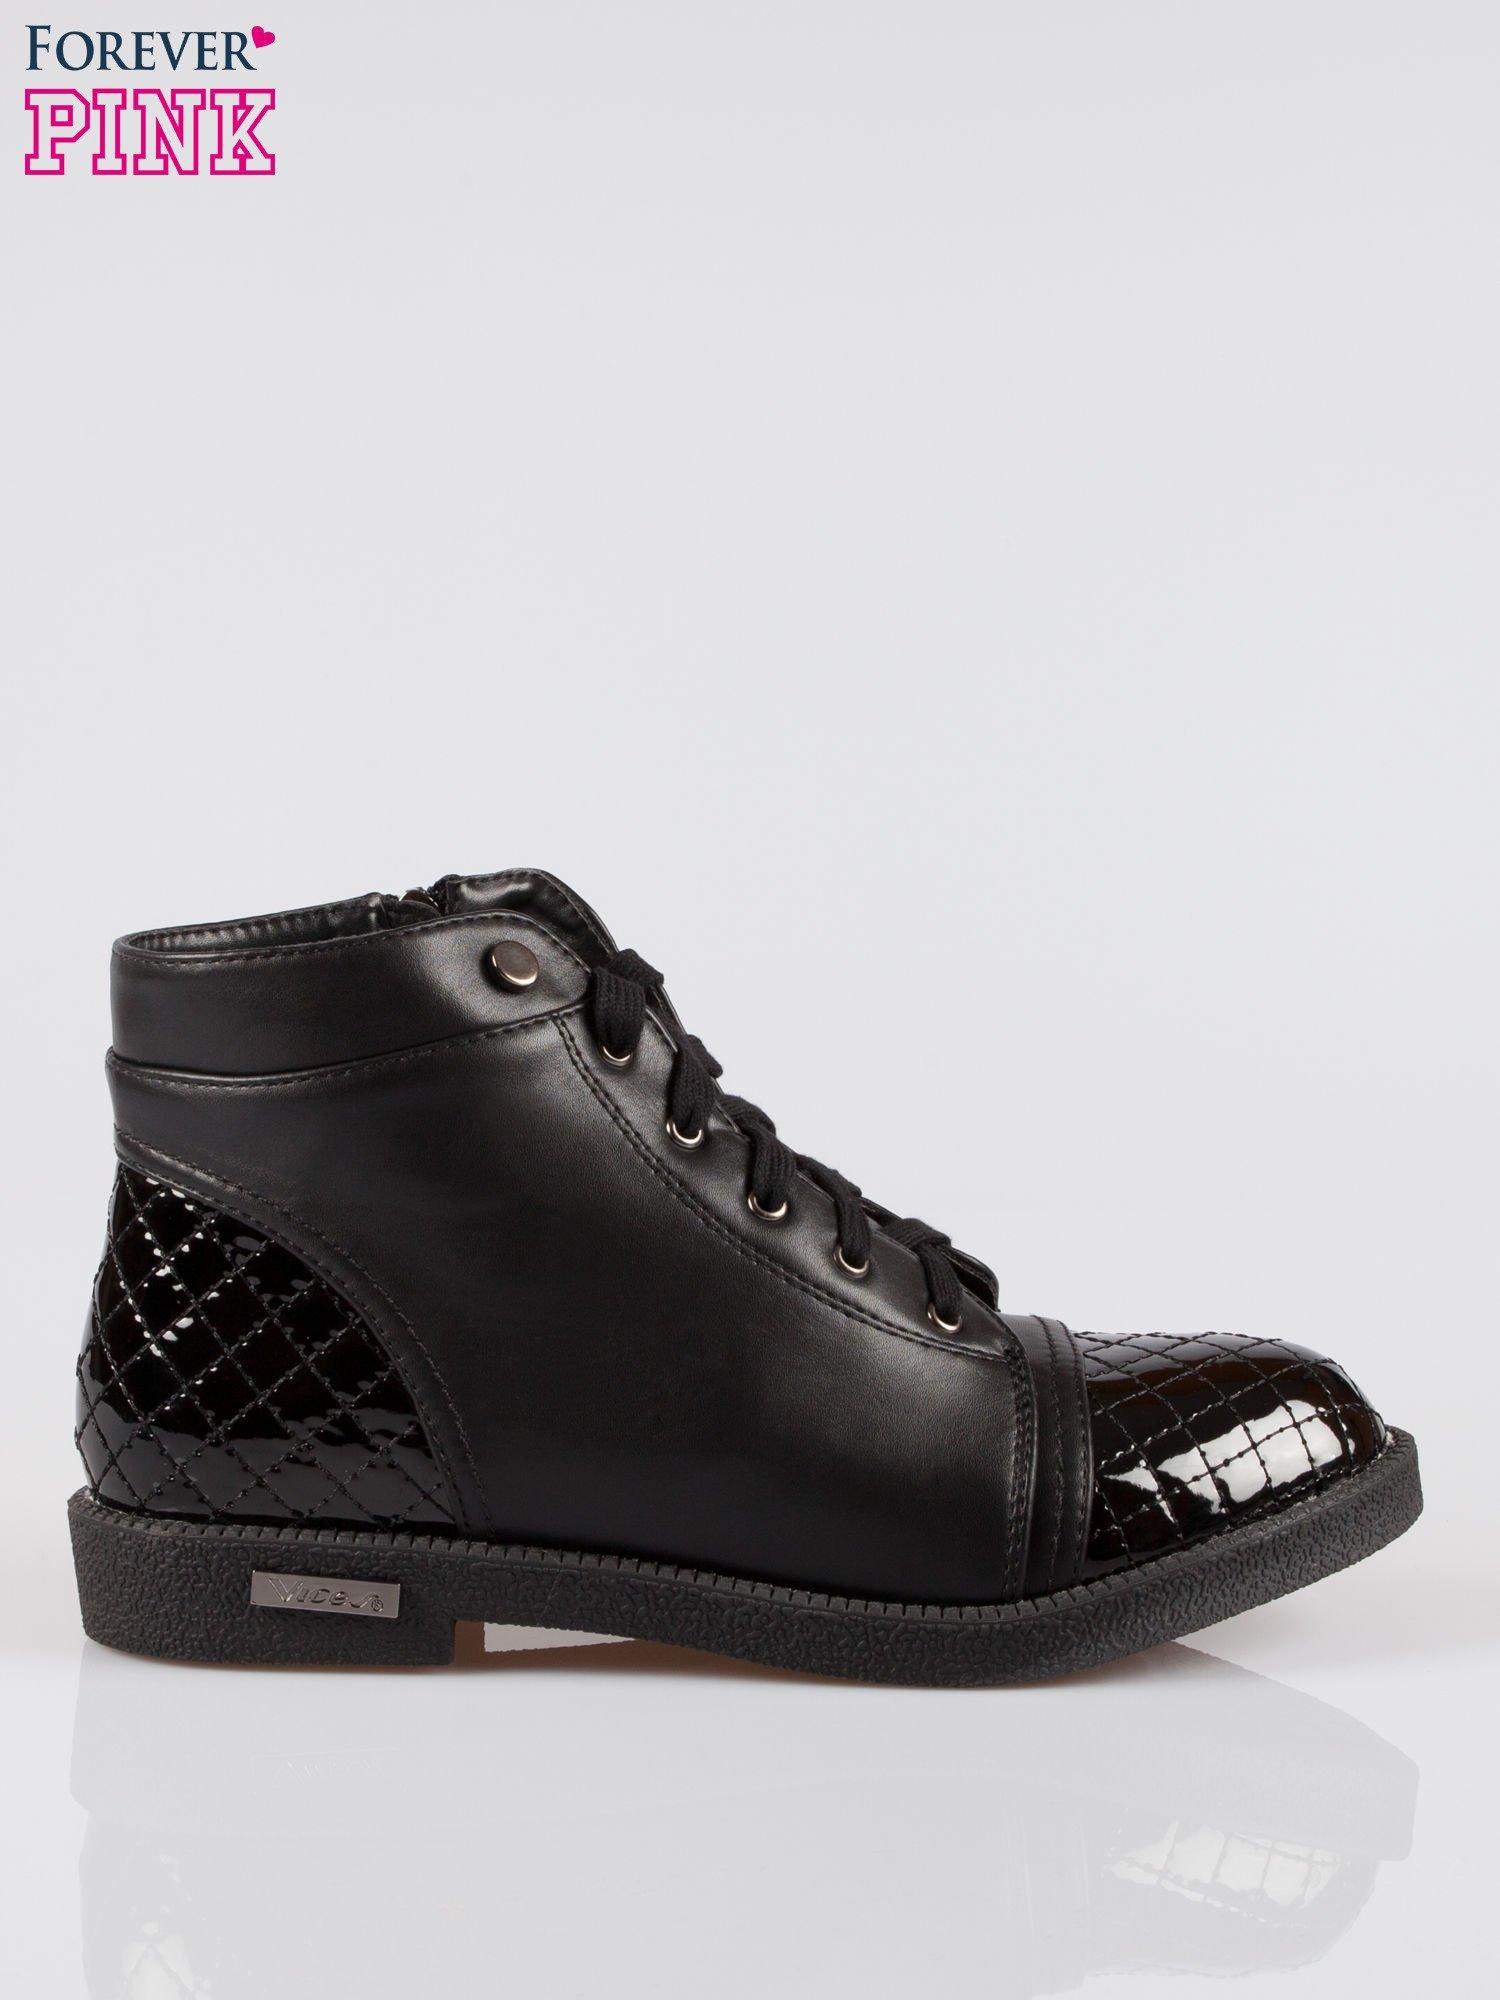 Czarne sznurowane botki damskie crocodile skin cap toe                                  zdj.                                  1